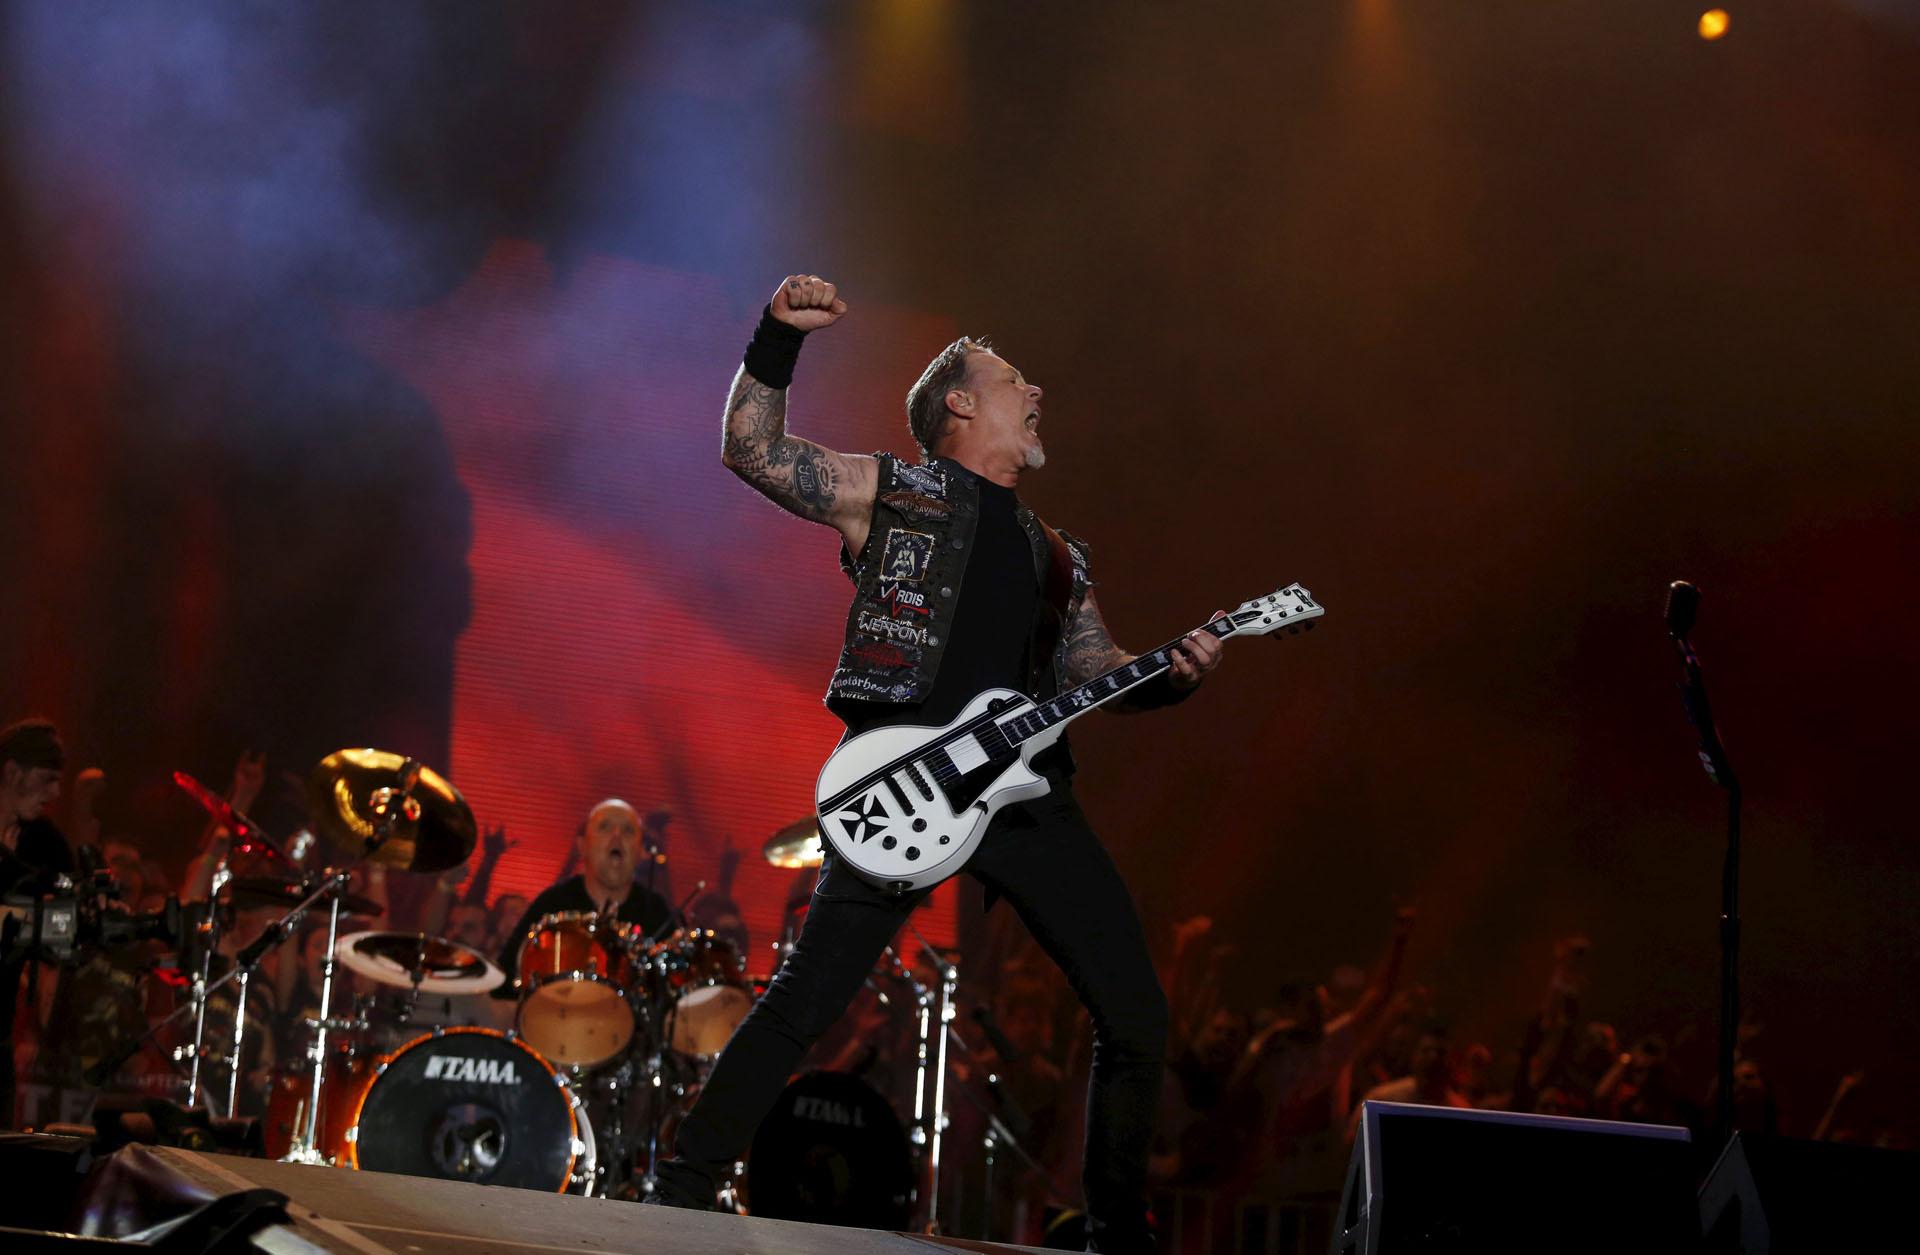 James Hetfield of Metallica perfoms during the Rock in Rio Music Festival in Rio de Janeiro, Brazil, September 20, 2015. REUTERS/Pilar Olivares